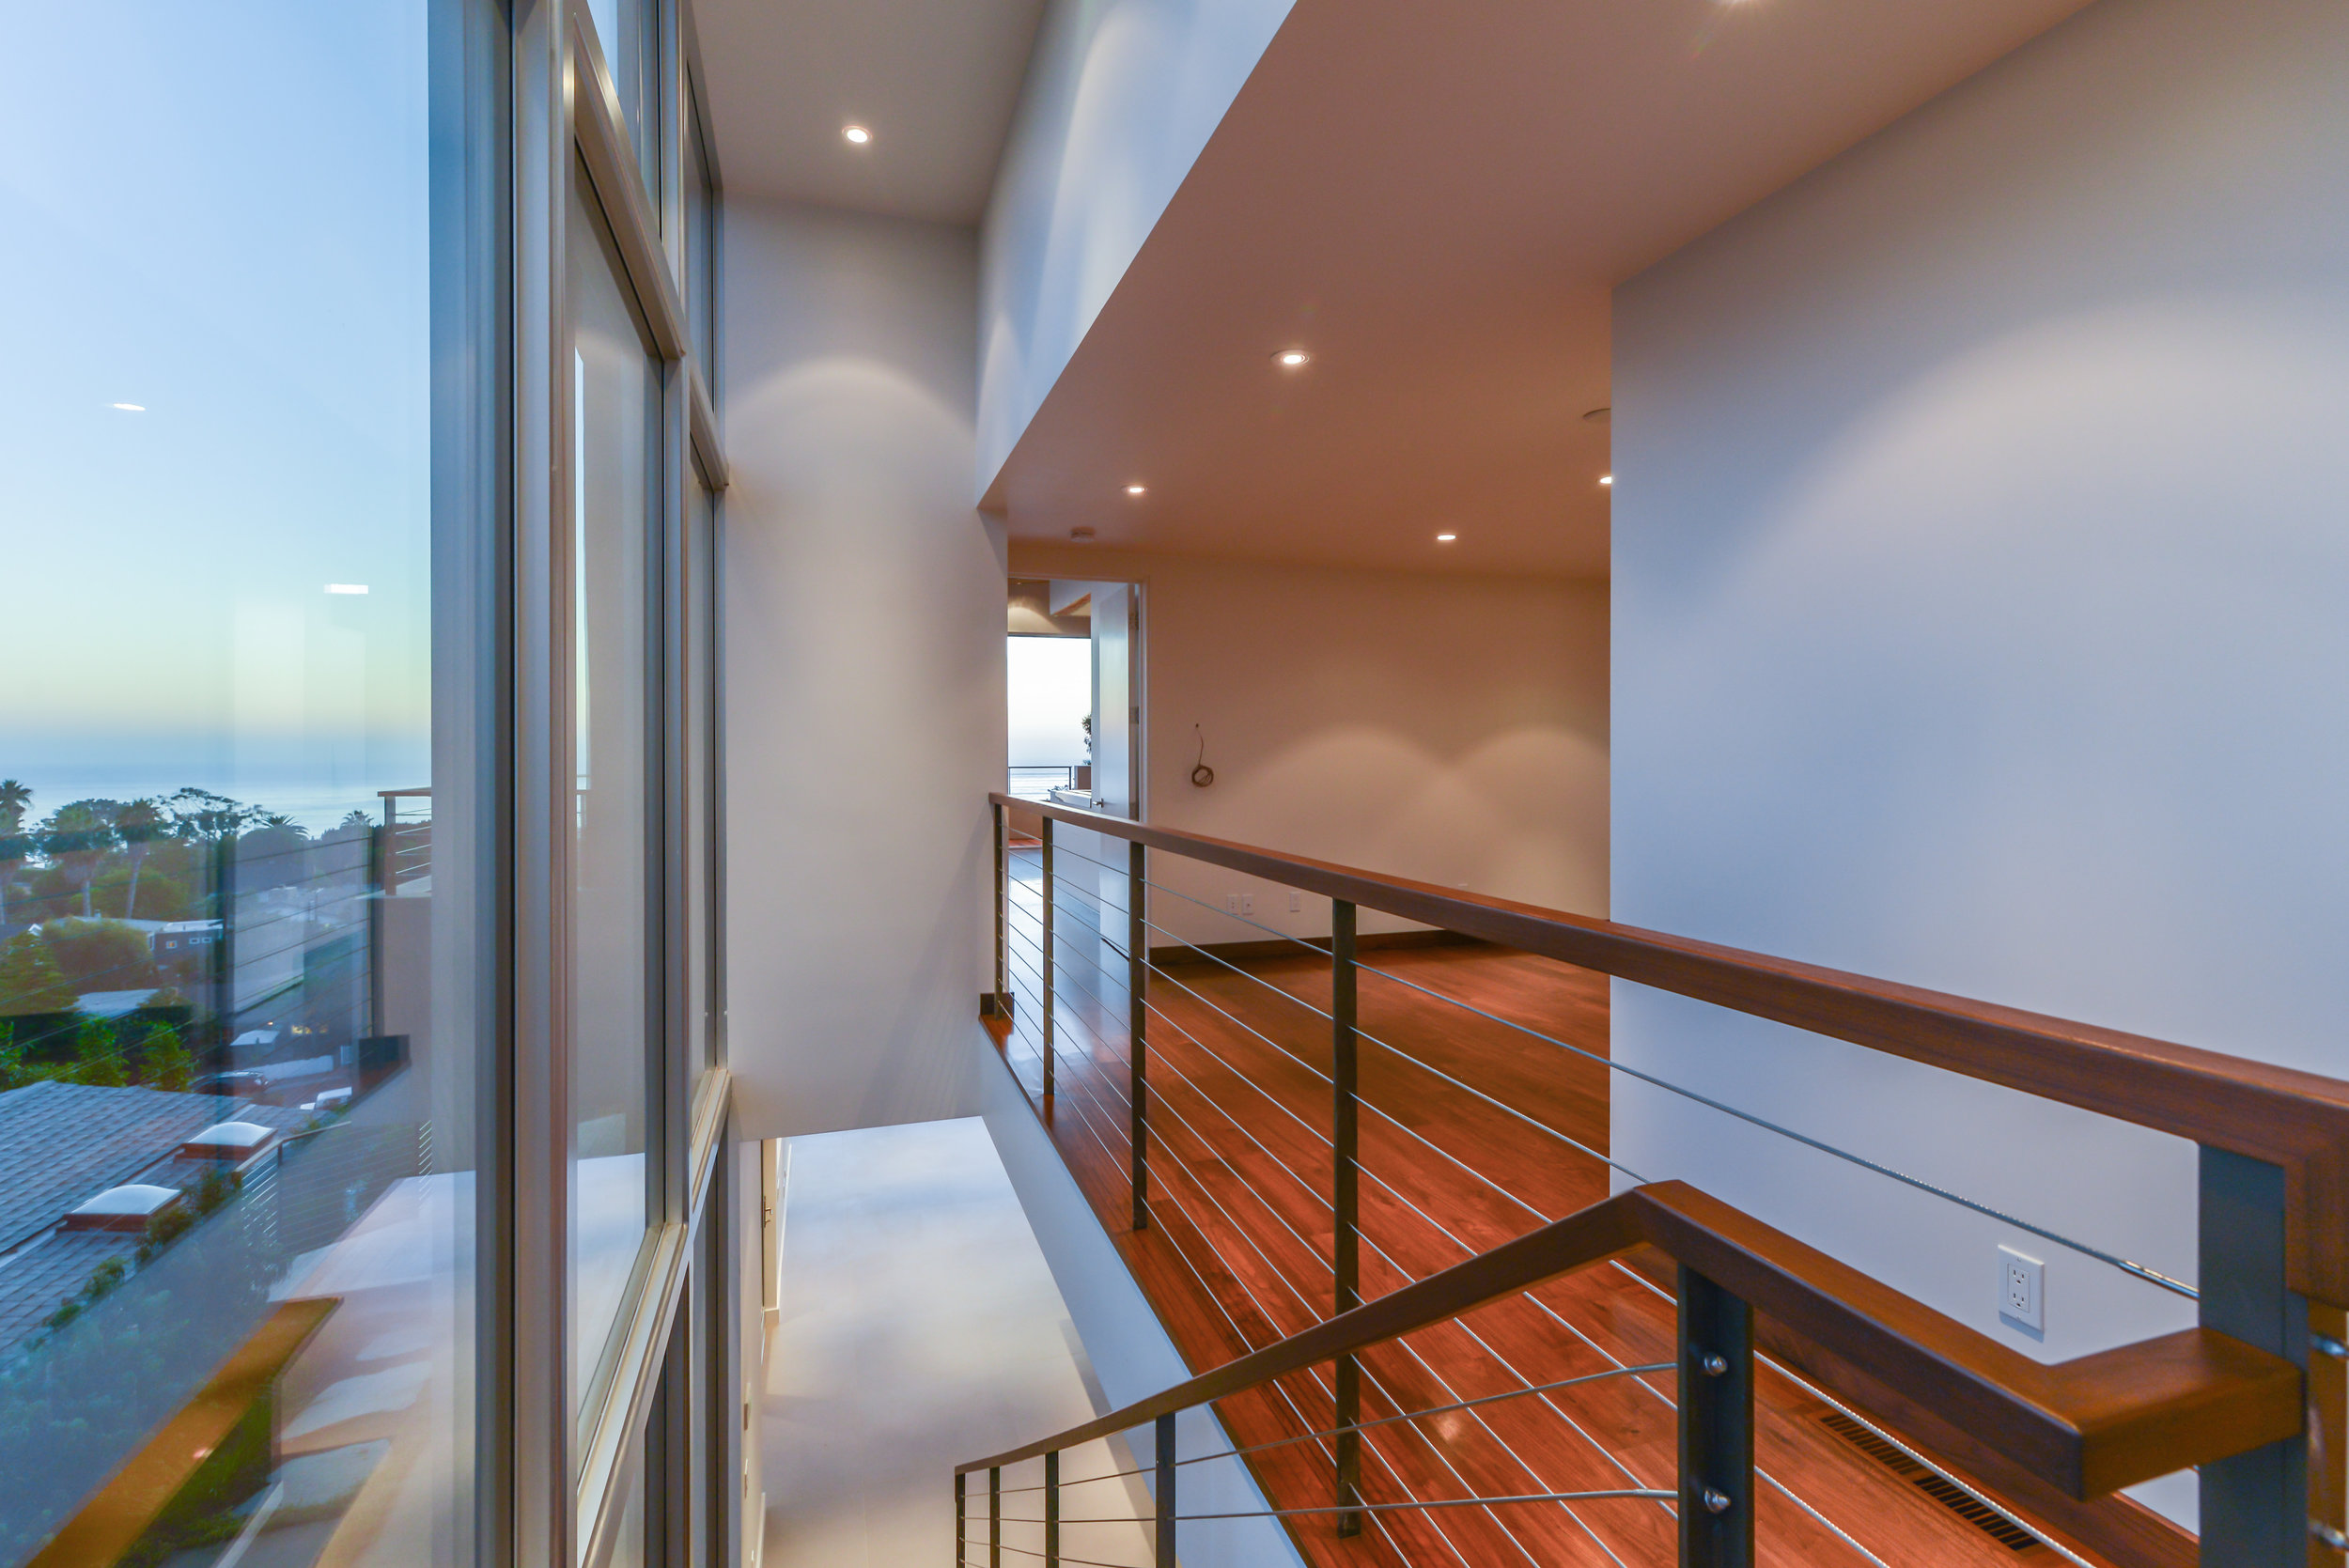 S.E.A.-Studio-Environmental-Architecture-David-Hertz-FAIA-Linda-Rosa-House-La-Jolla-San-Diego-sustainable-regenerative-restorative-design-modern-residential-mindful-garden-panoramic-ocean-view-open-concept-california-dream-8.jpg